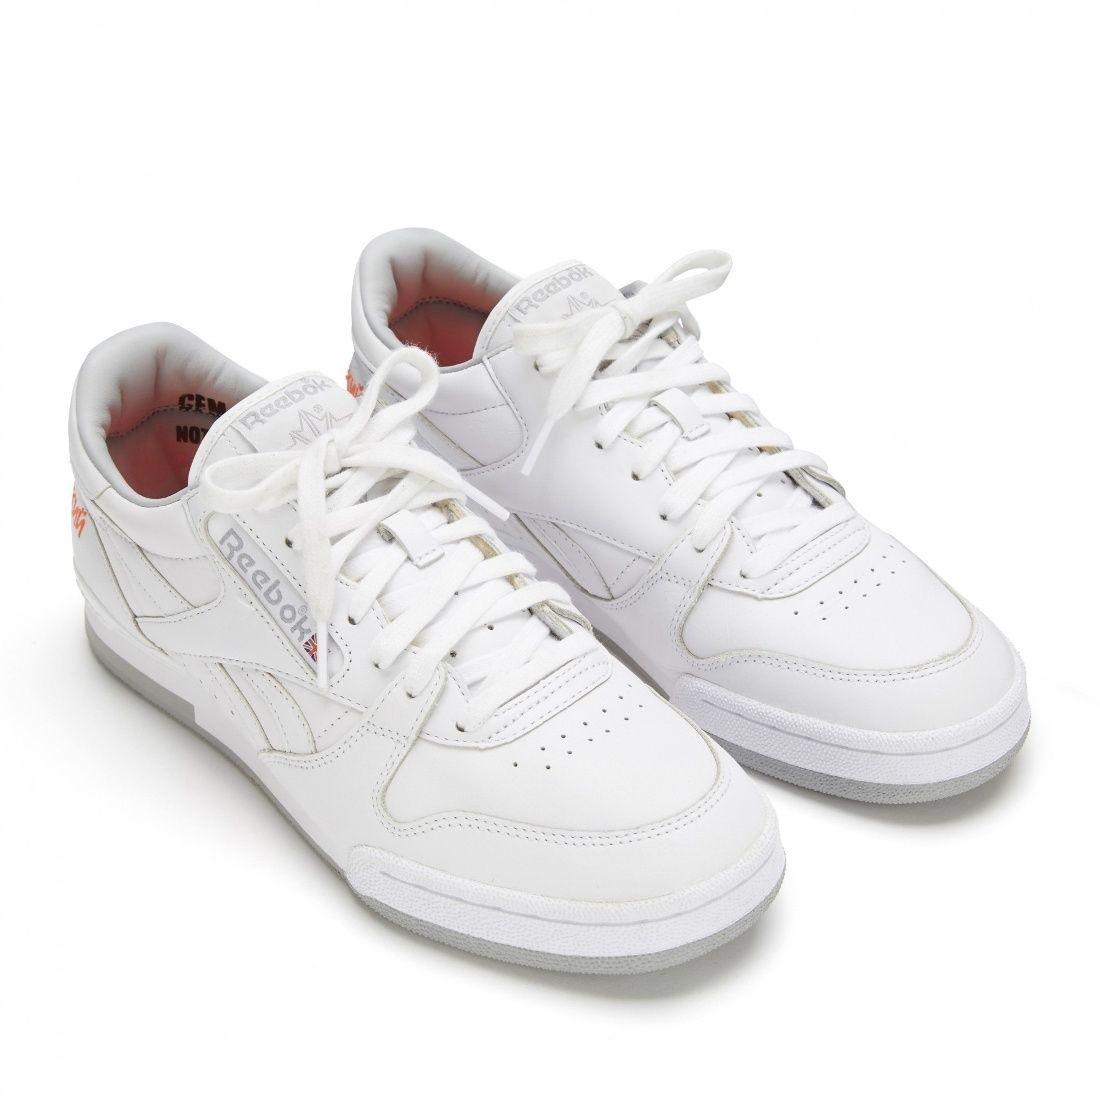 Gosha Rubchinskiy Size 8225Reebok Gosha Reebok White NkXOP8n0wZ